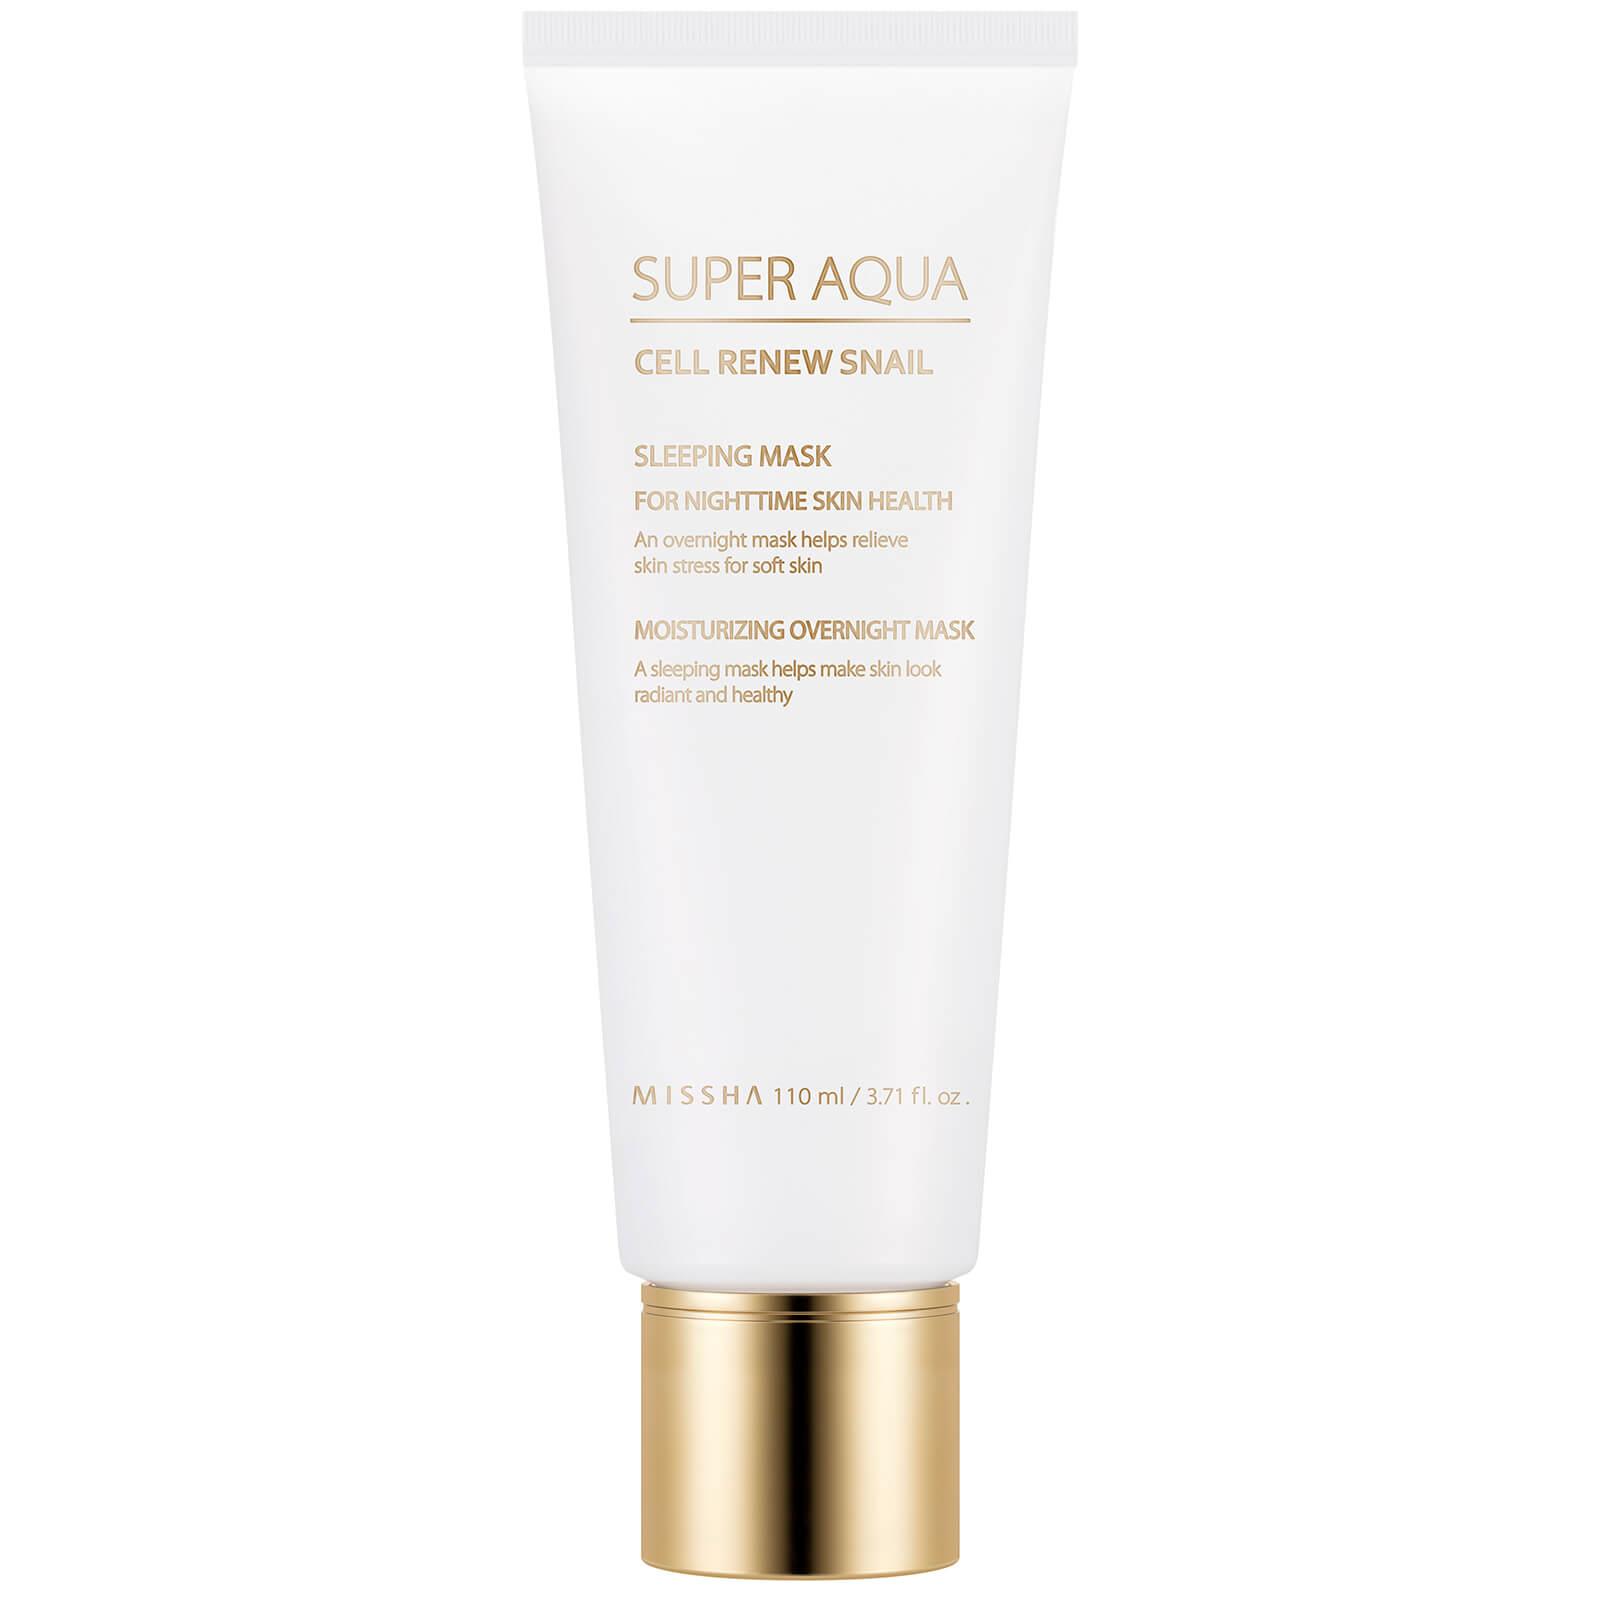 Купить MISSHA Super Aqua Cell Renew Snail Sleeping Mask 110ml